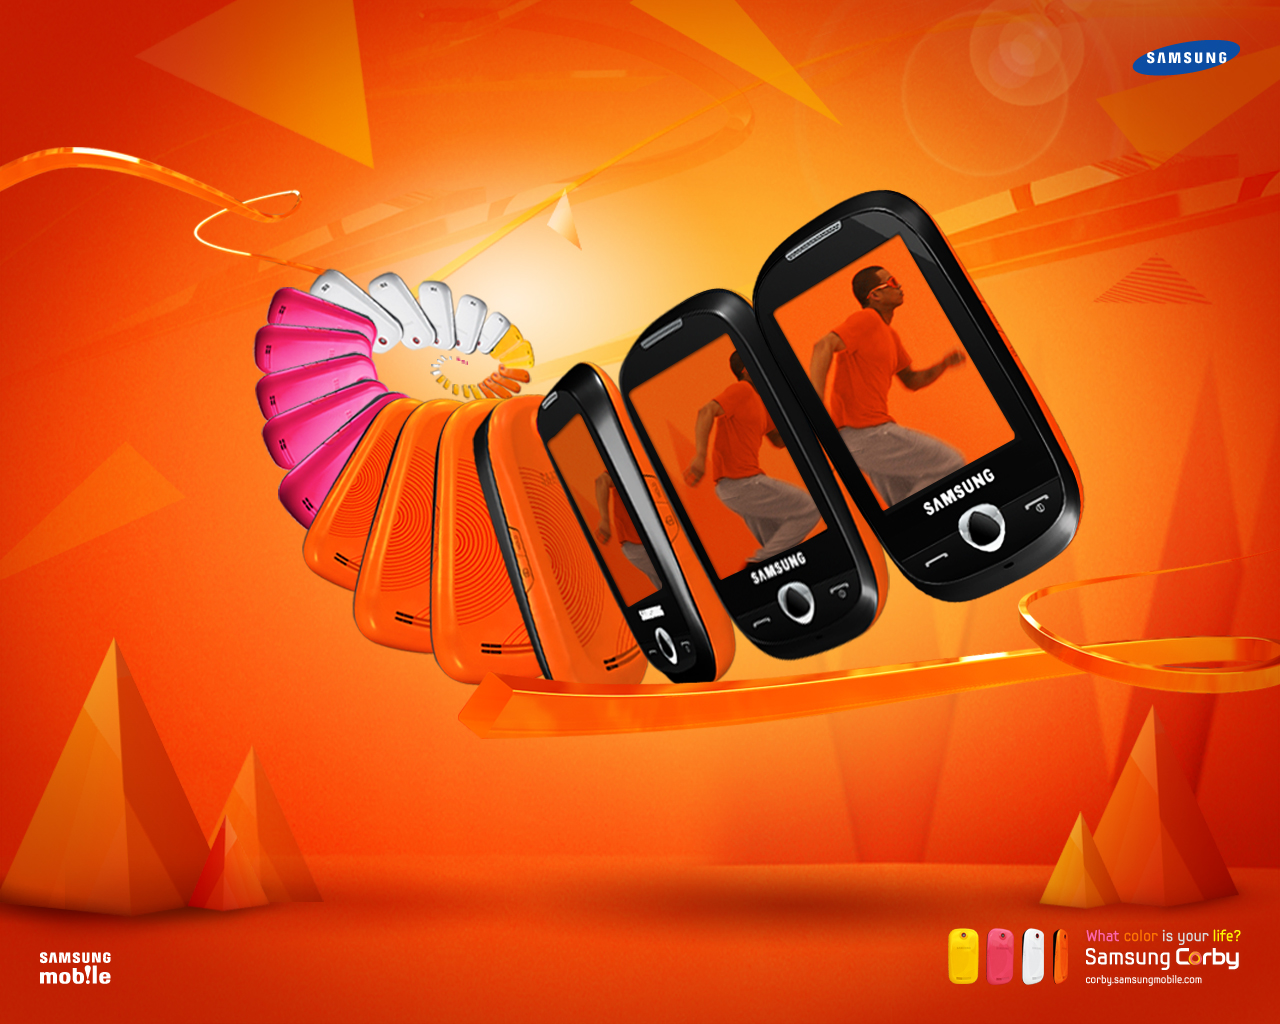 Celular Samsung CORBY II GT S3850 Amarelo